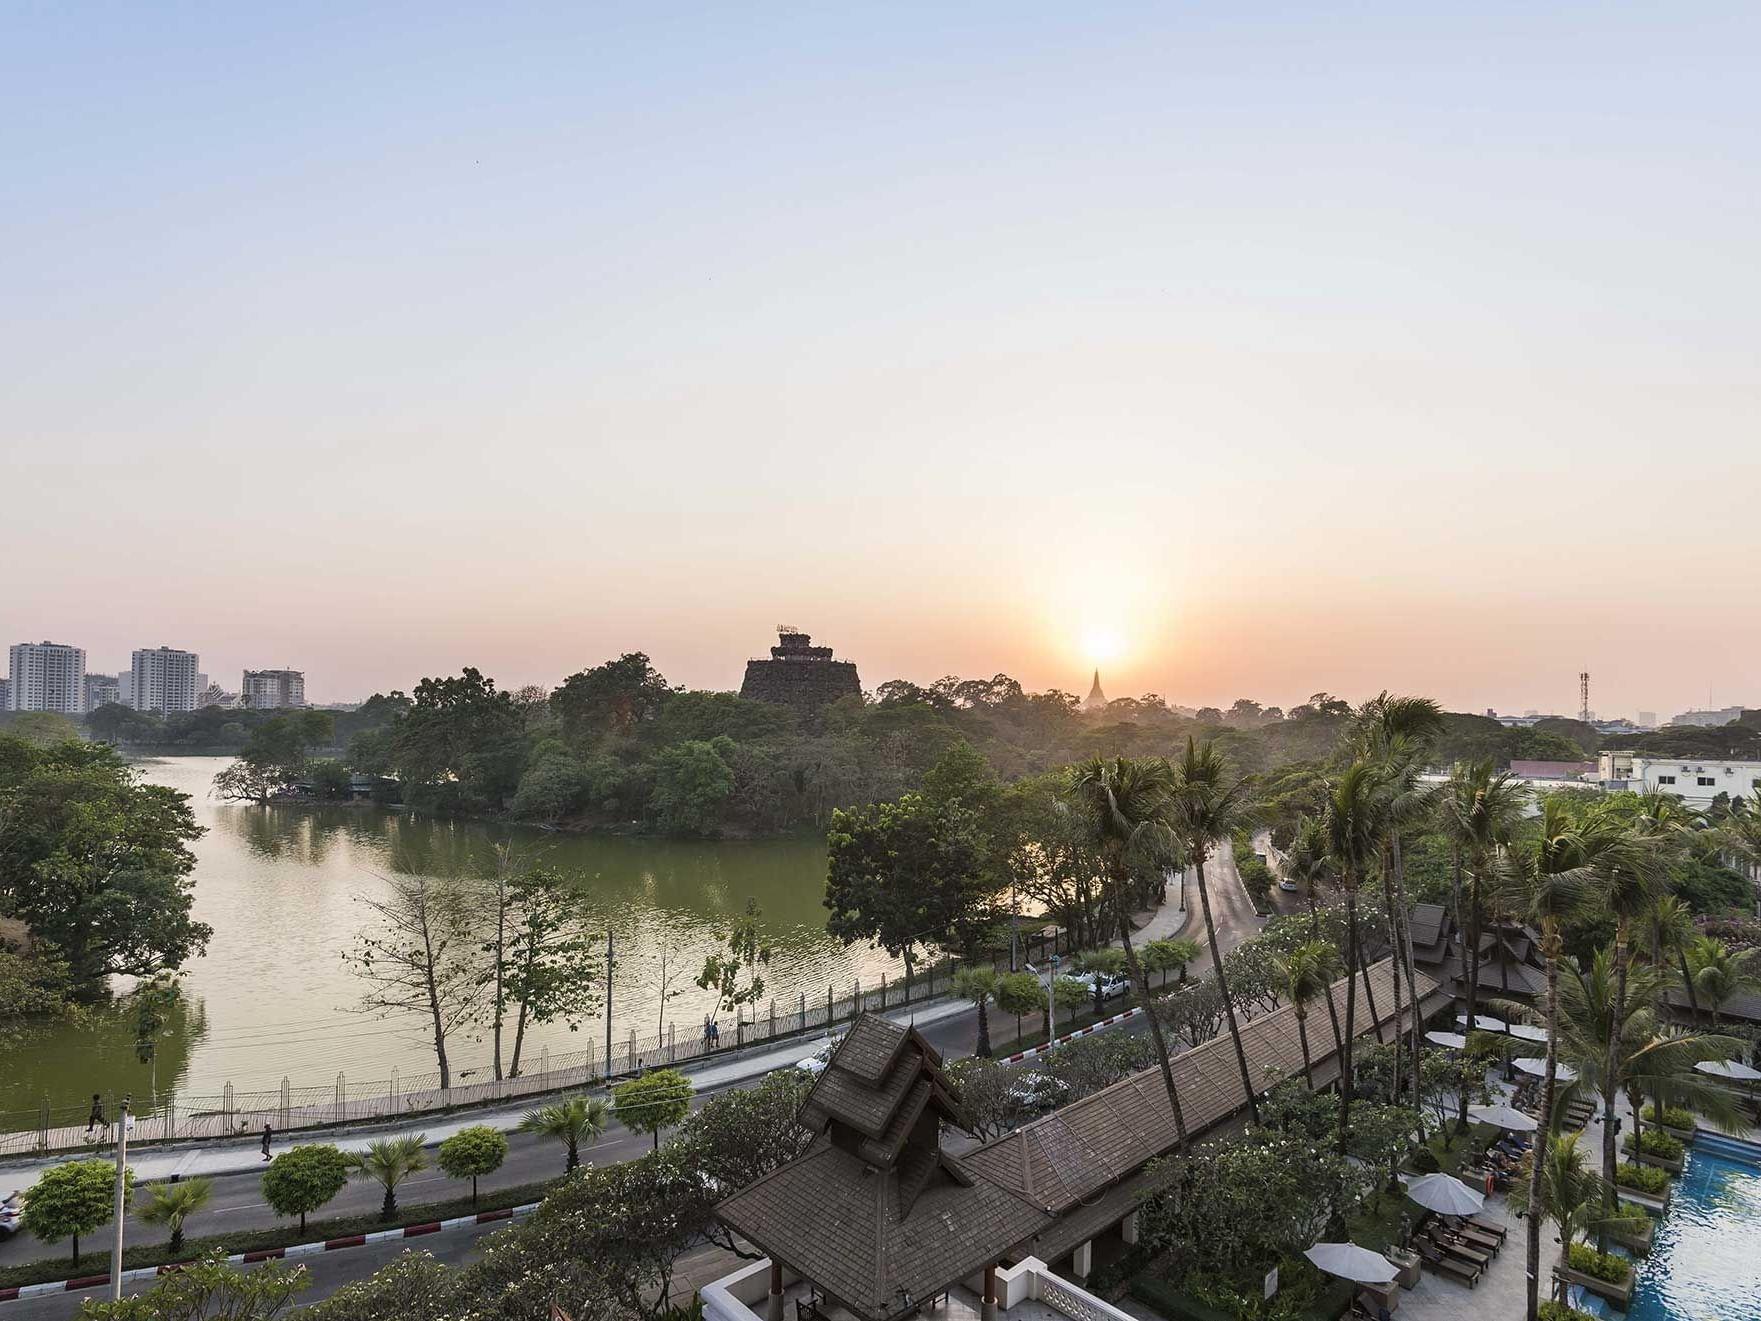 Top view of the Lake from Premier Deluxe Room Lake Or Pagoda View at Chatrium Hotel Royal Lake Yangon